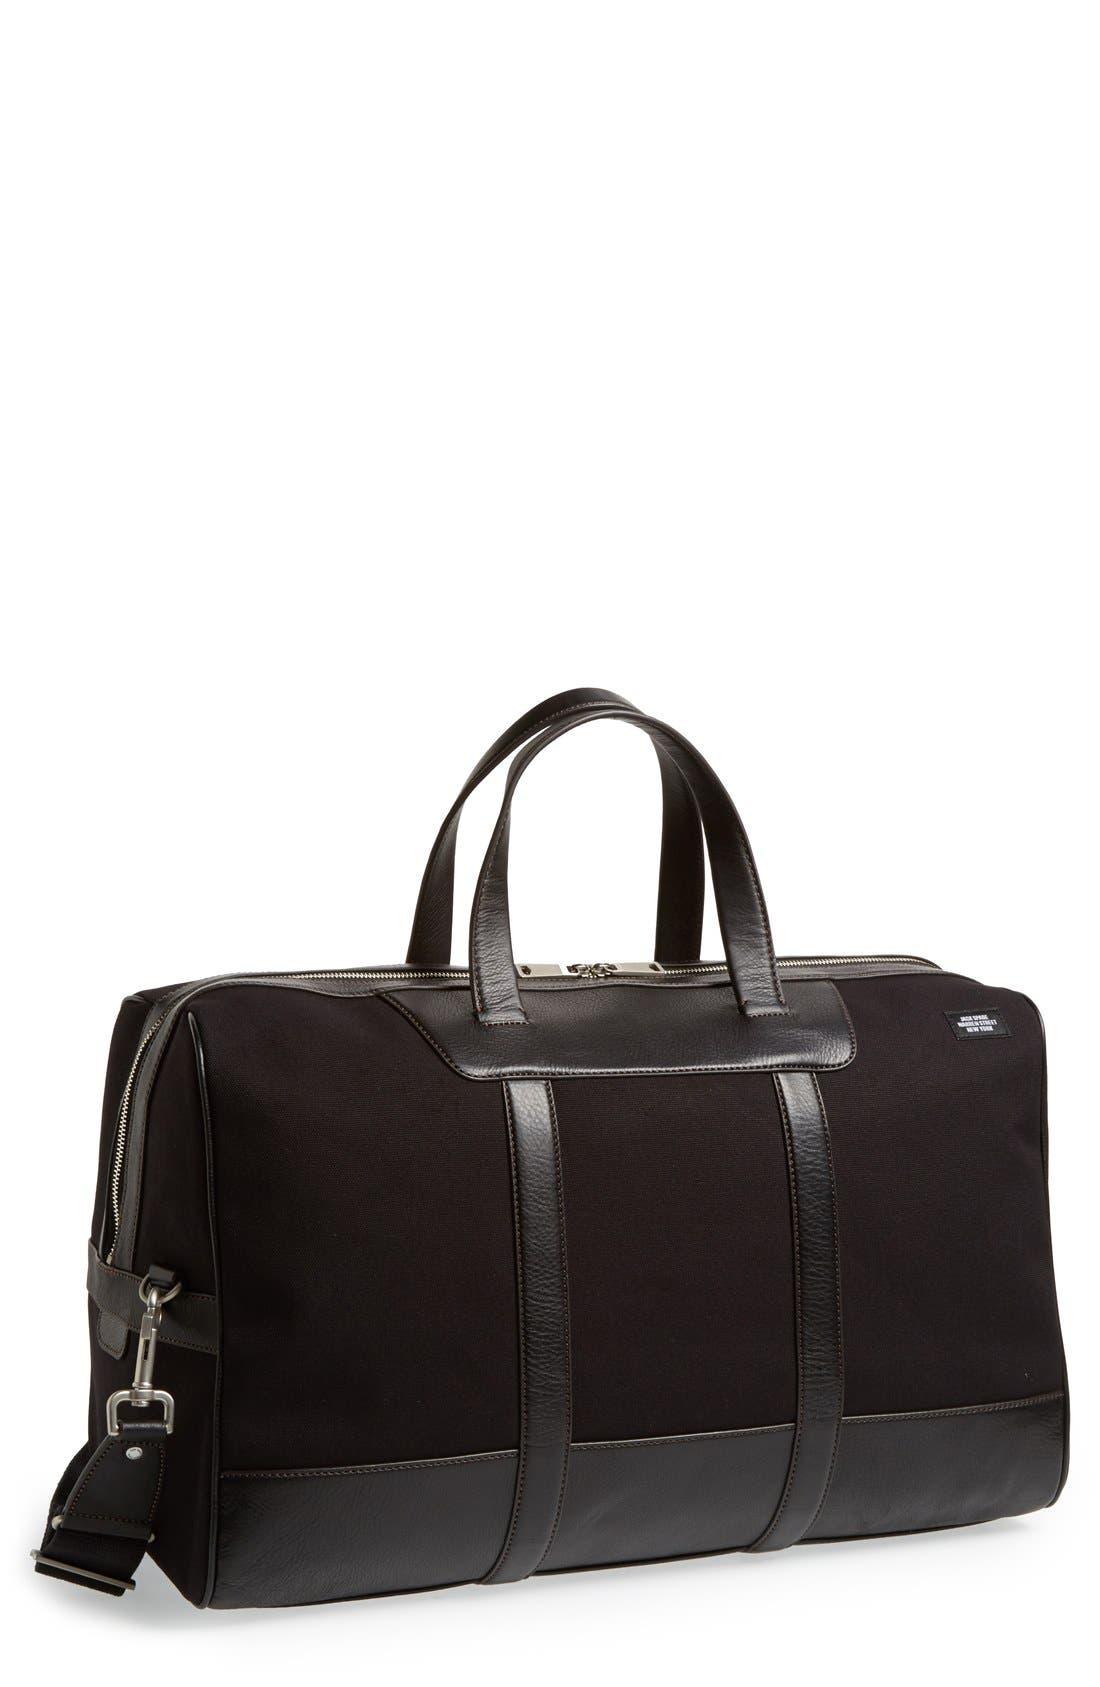 JACK SPADE 'Vault' Duffel Bag, Main, color, 001